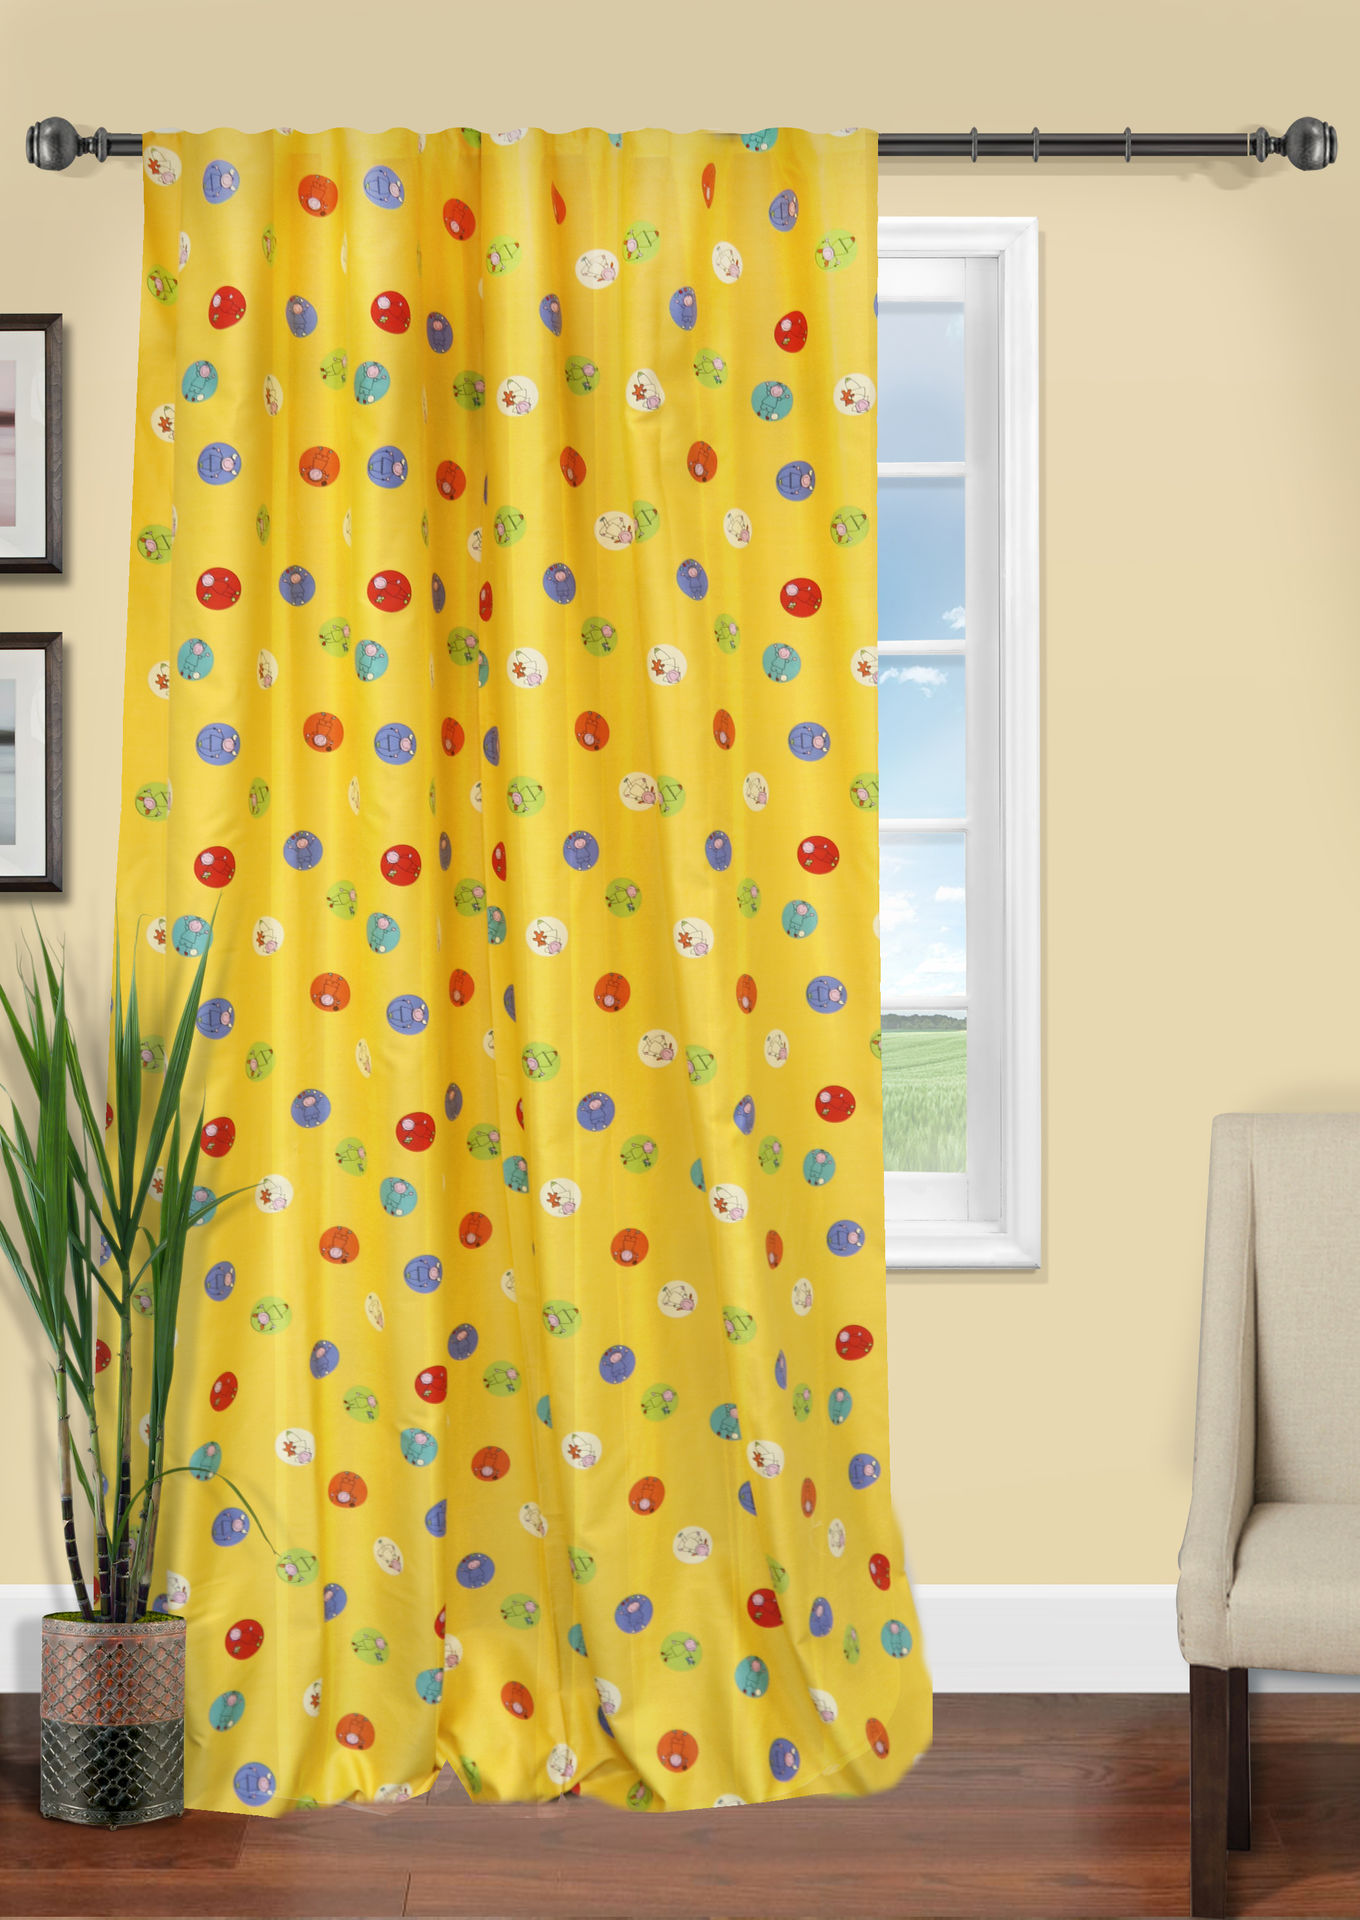 Шторы Kauffort Классические шторы Tazos Цвет: Желтый шторы kauffort классические шторы montana xl цвет фиолетовый желтый